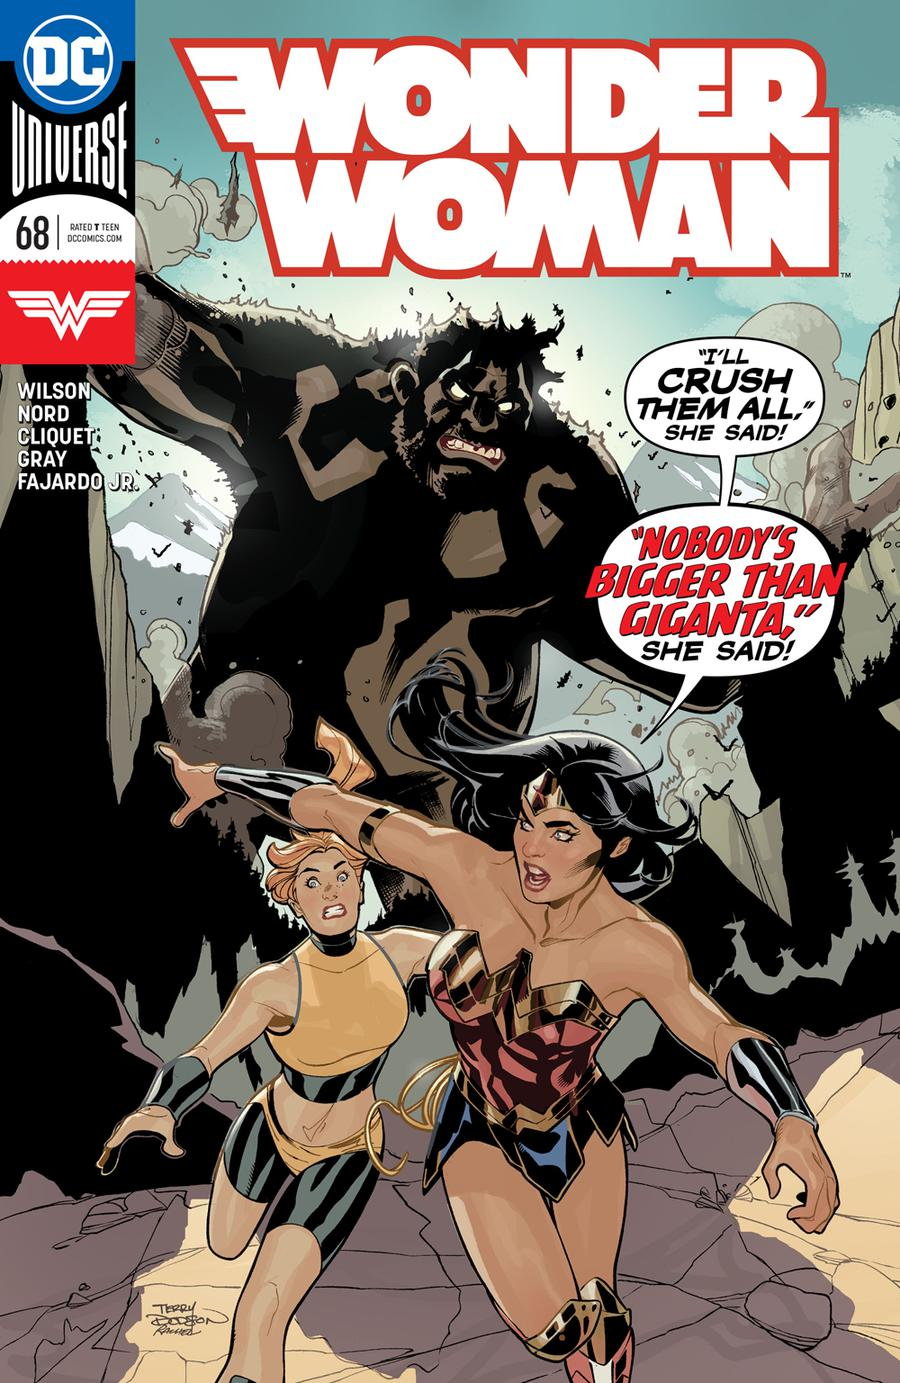 Wonder Woman Vol 5 #68 Cover A Regular Terry Dodson & Rachel Dodson Cover